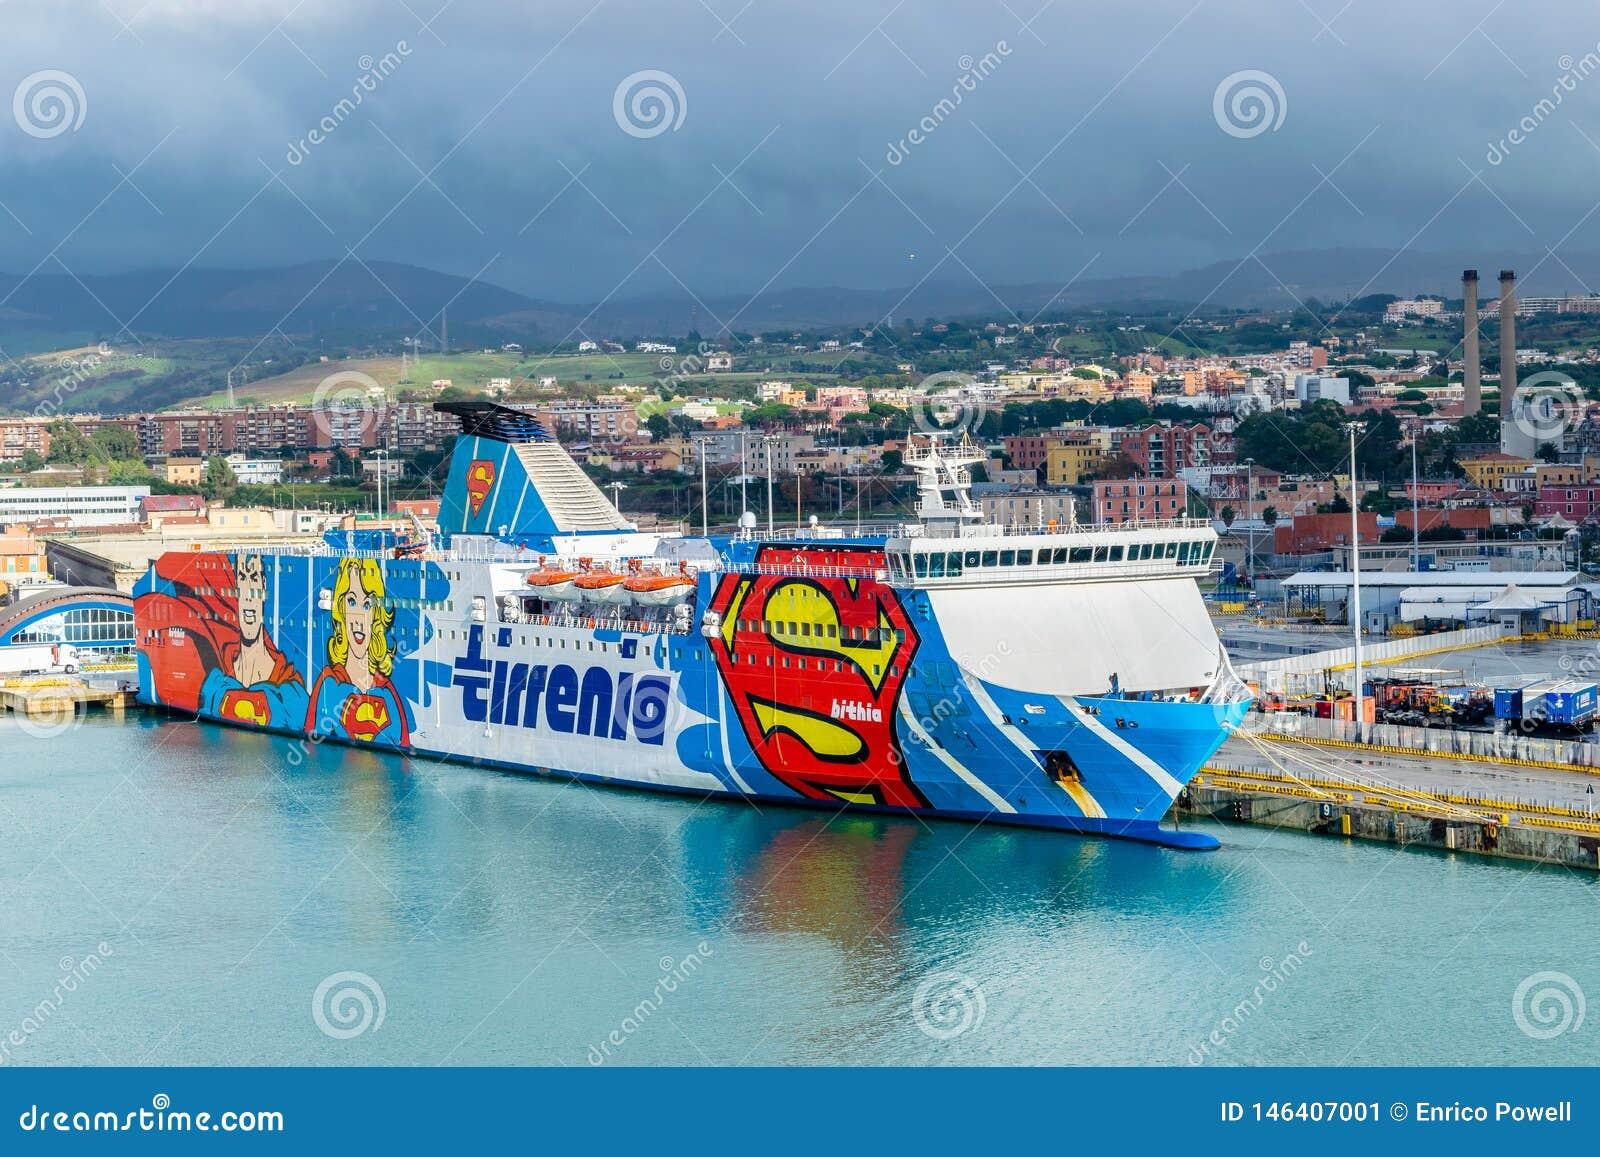 Transbordador de Tirrenia Bithia en el puerto de Civitavecchia, Roma